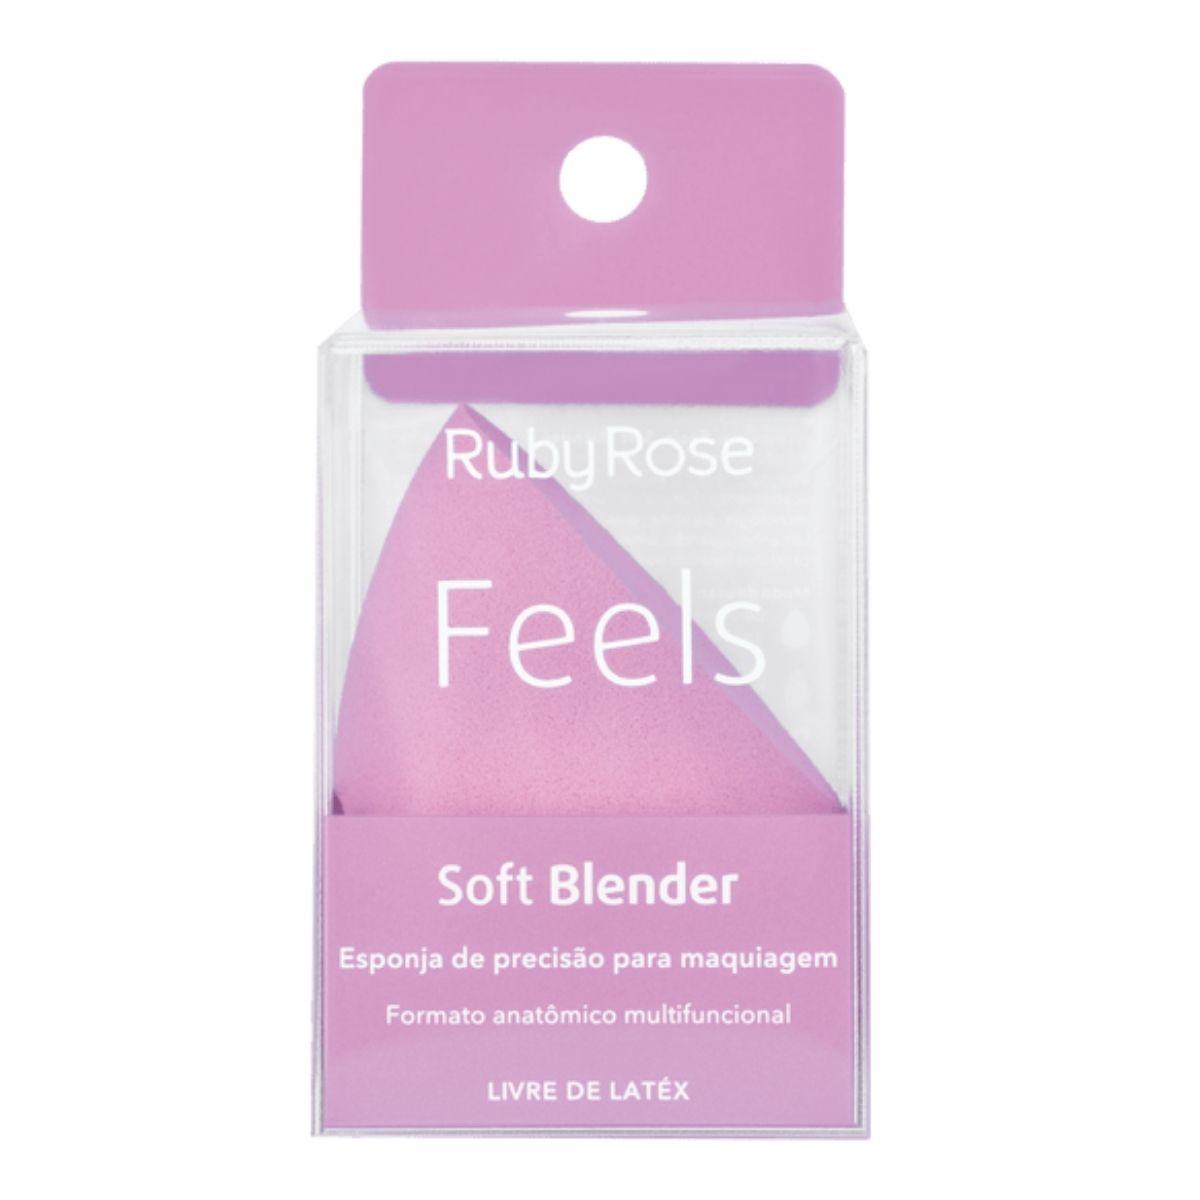 Esponja de Maquiagem Soft Blender Feels Ruby Rose HB-S01